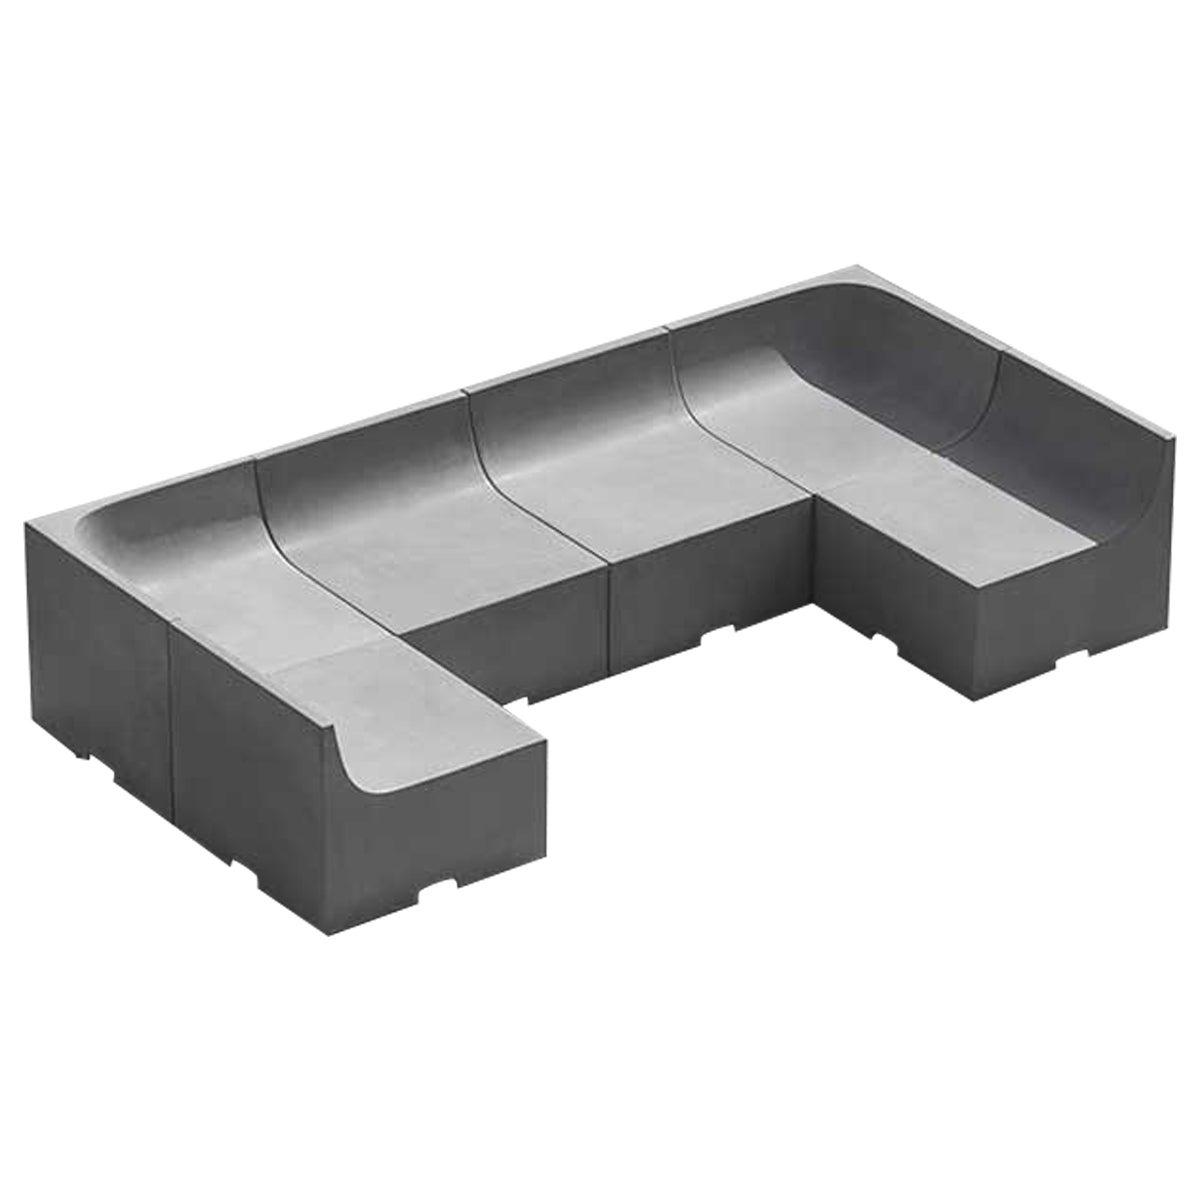 'SHI' Modular Bench / Sofa Made of Concrete